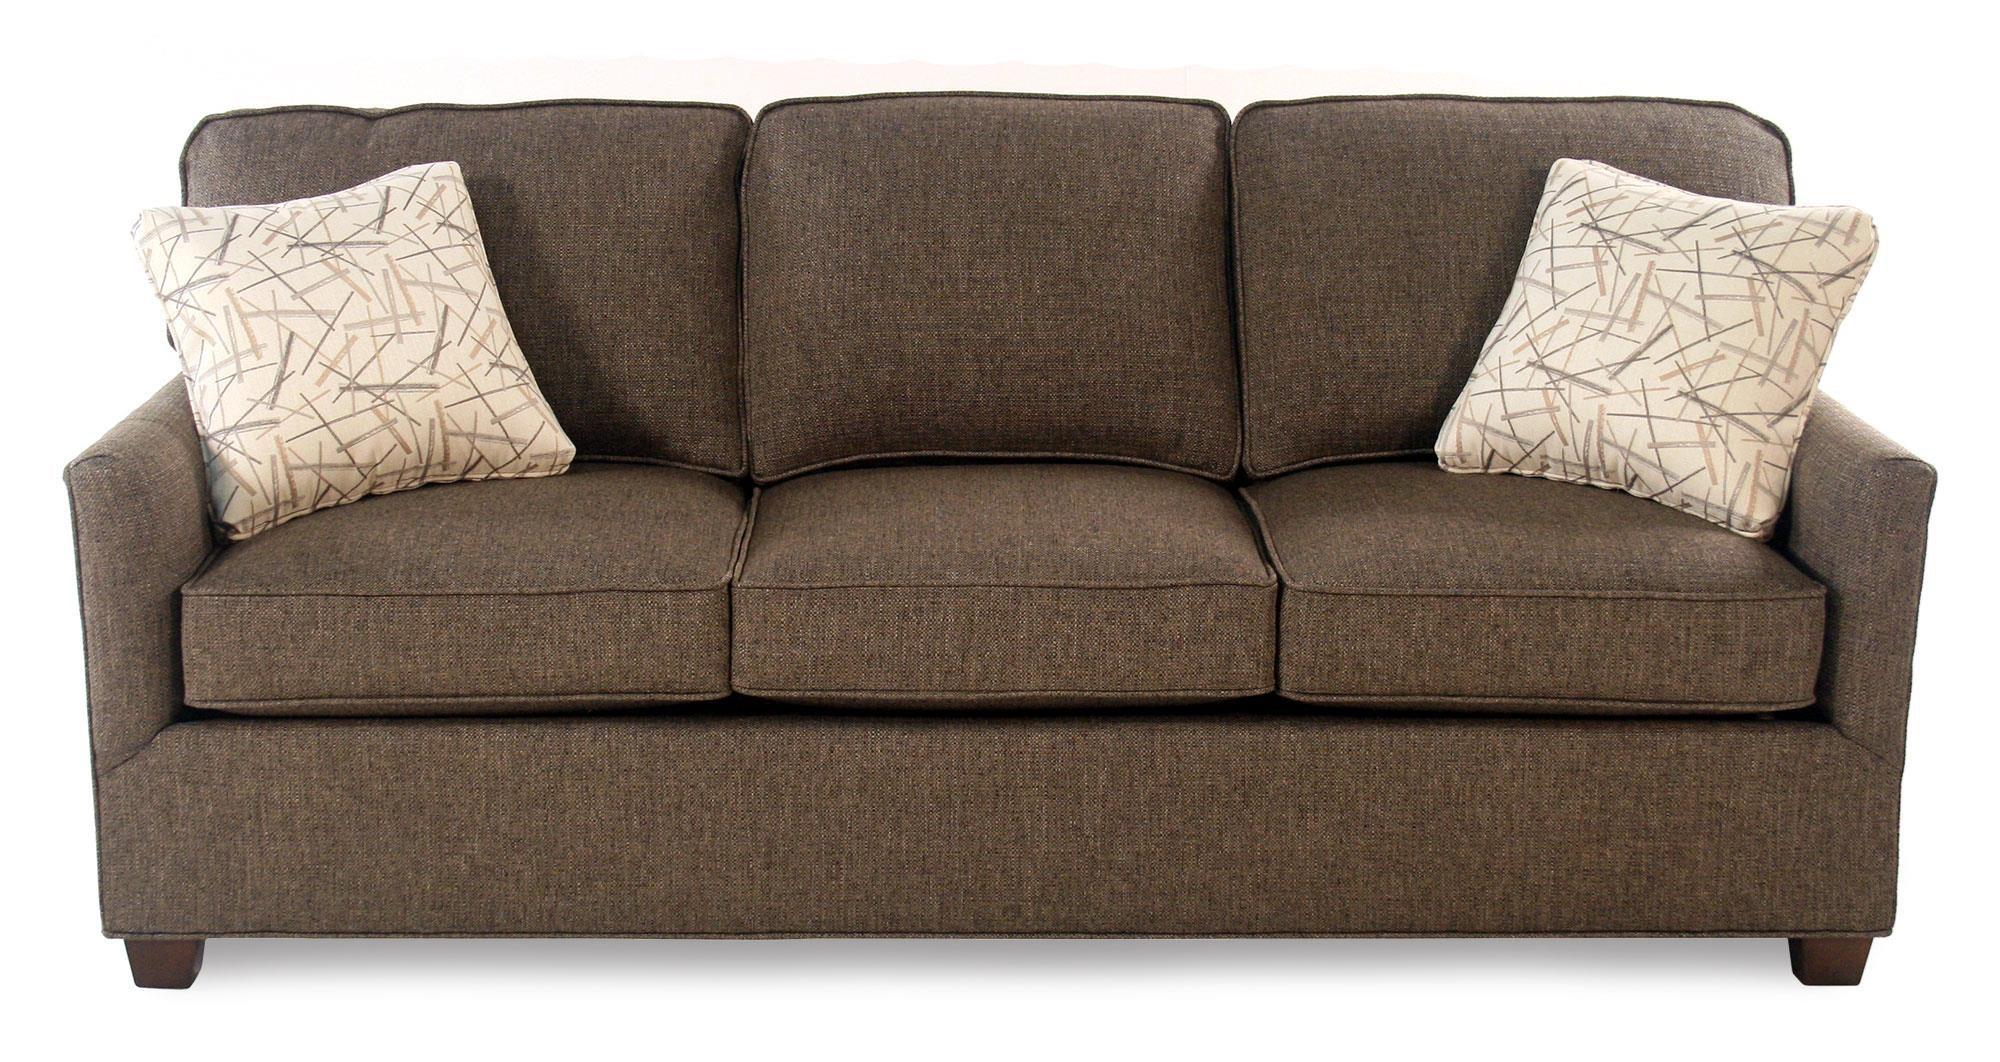 Hallagan Furniture Highland Park Sofa - Item Number: 44-ABT-MR-D3-22-PFS